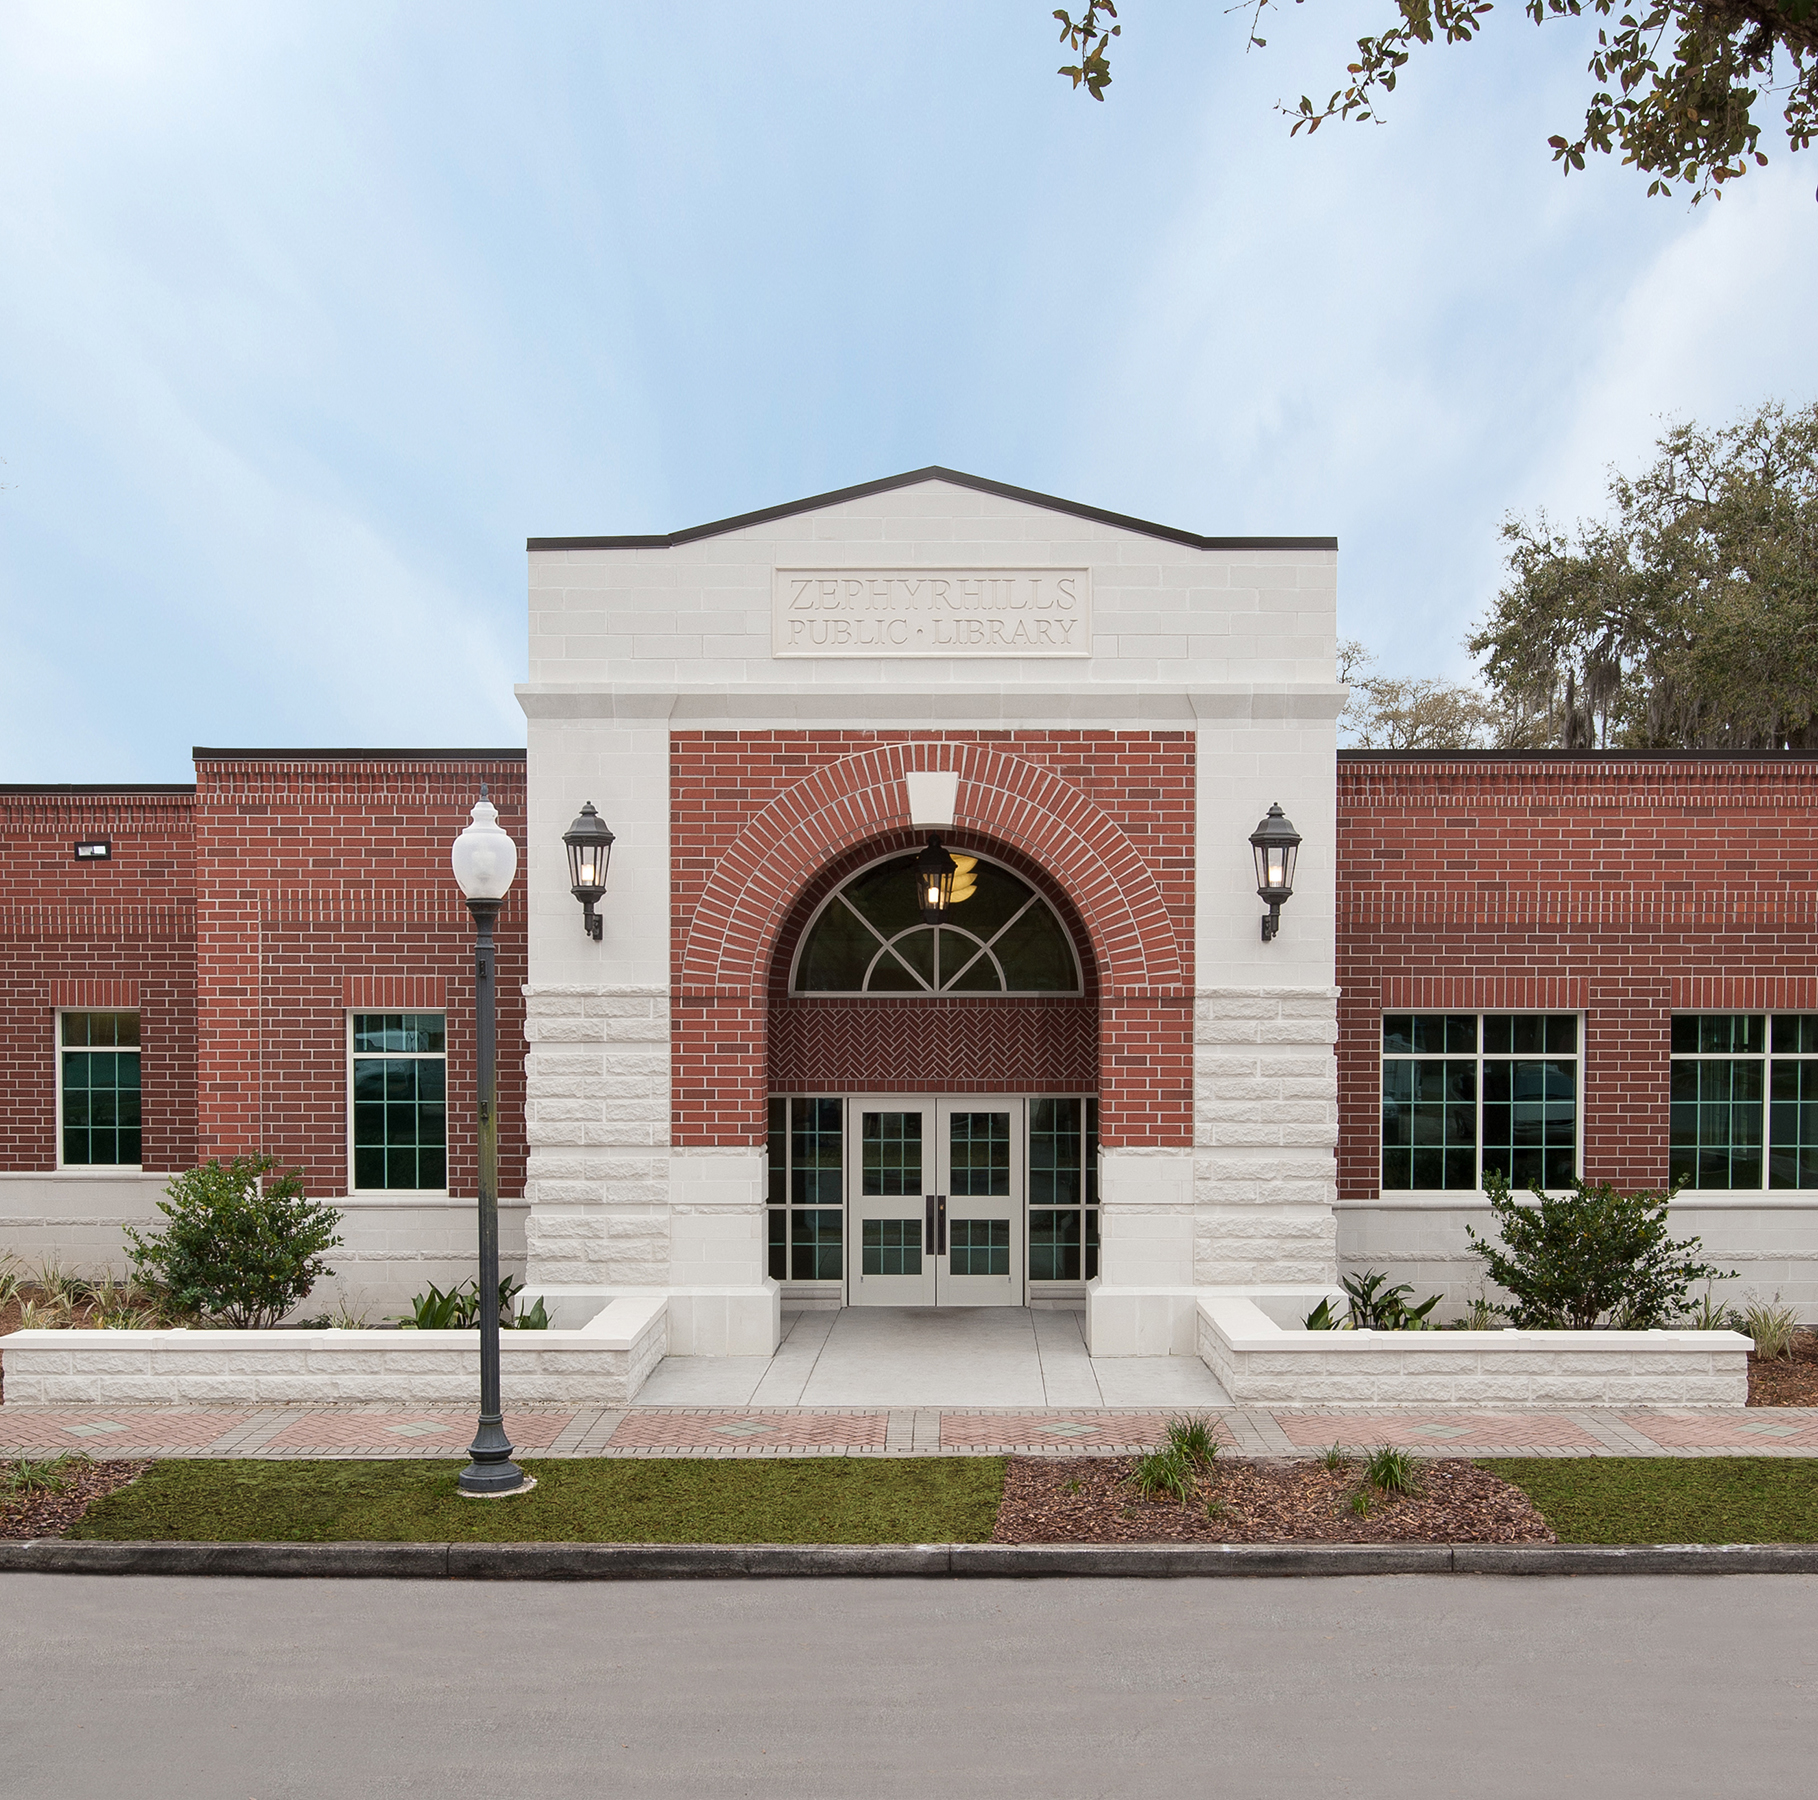 Zephyrhills Public Library